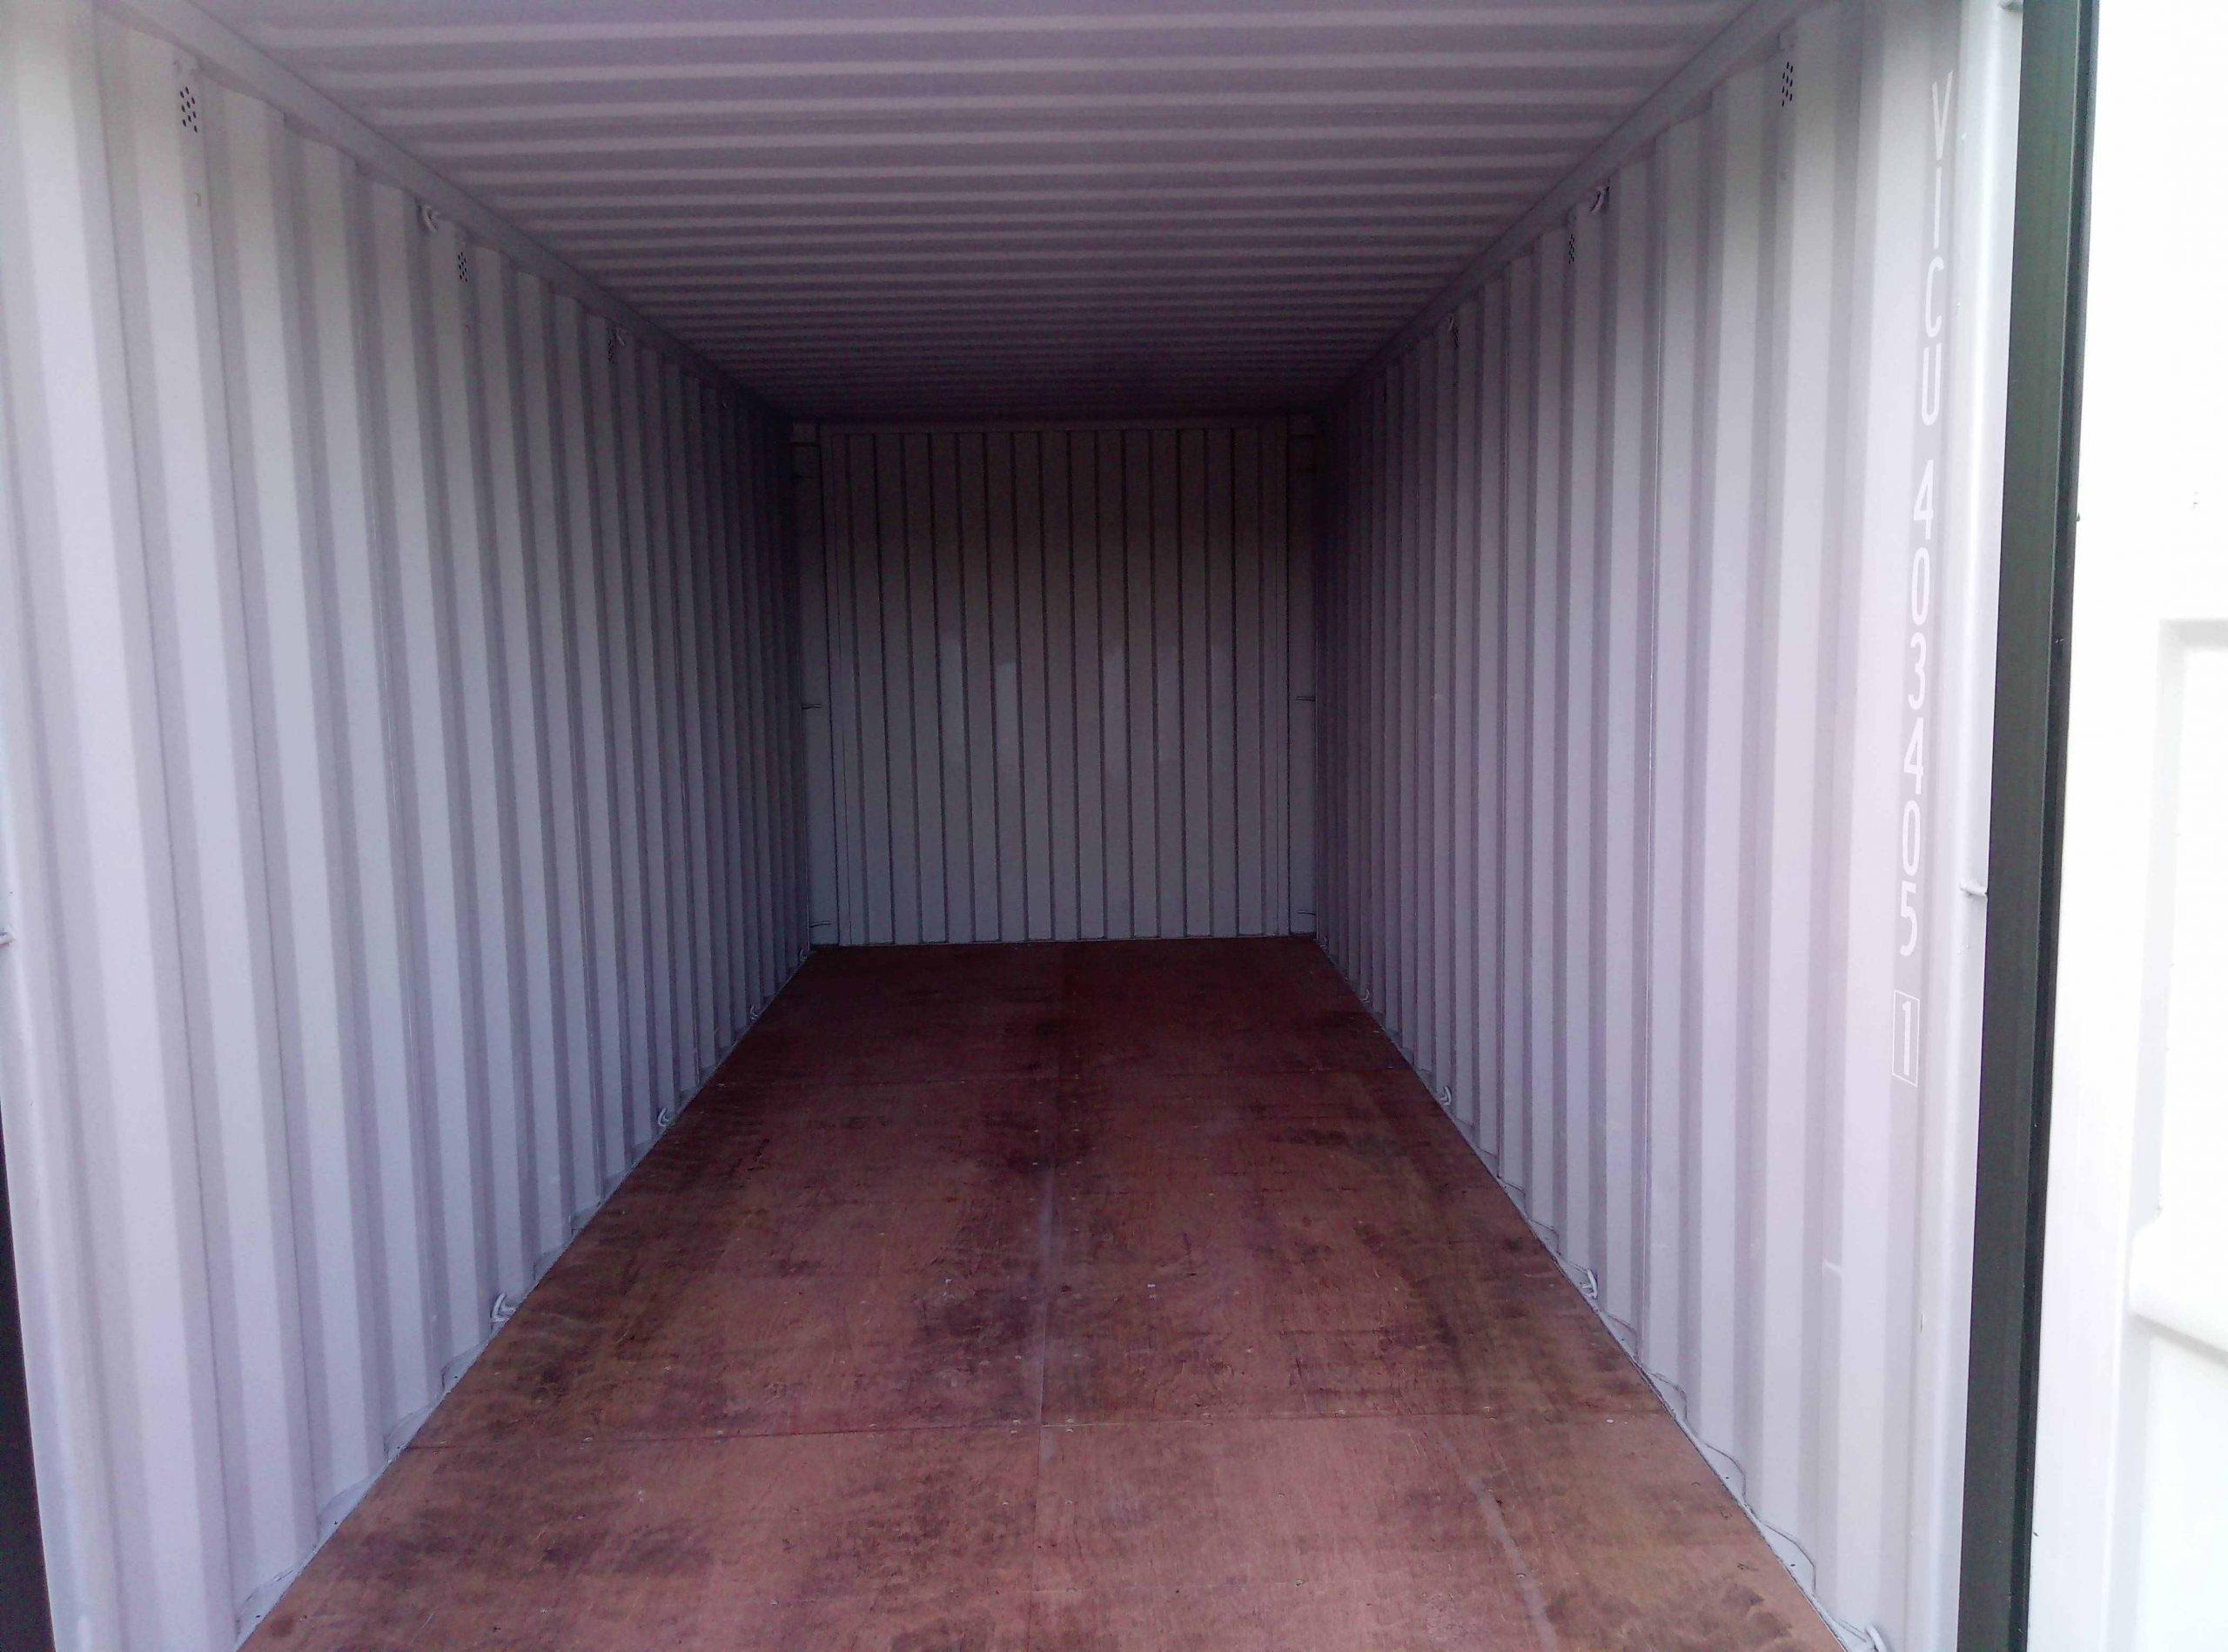 Metal Box Storage Ltd a storage company in Burnt House Lane, Bransgore,dorset, Christchurch, UK